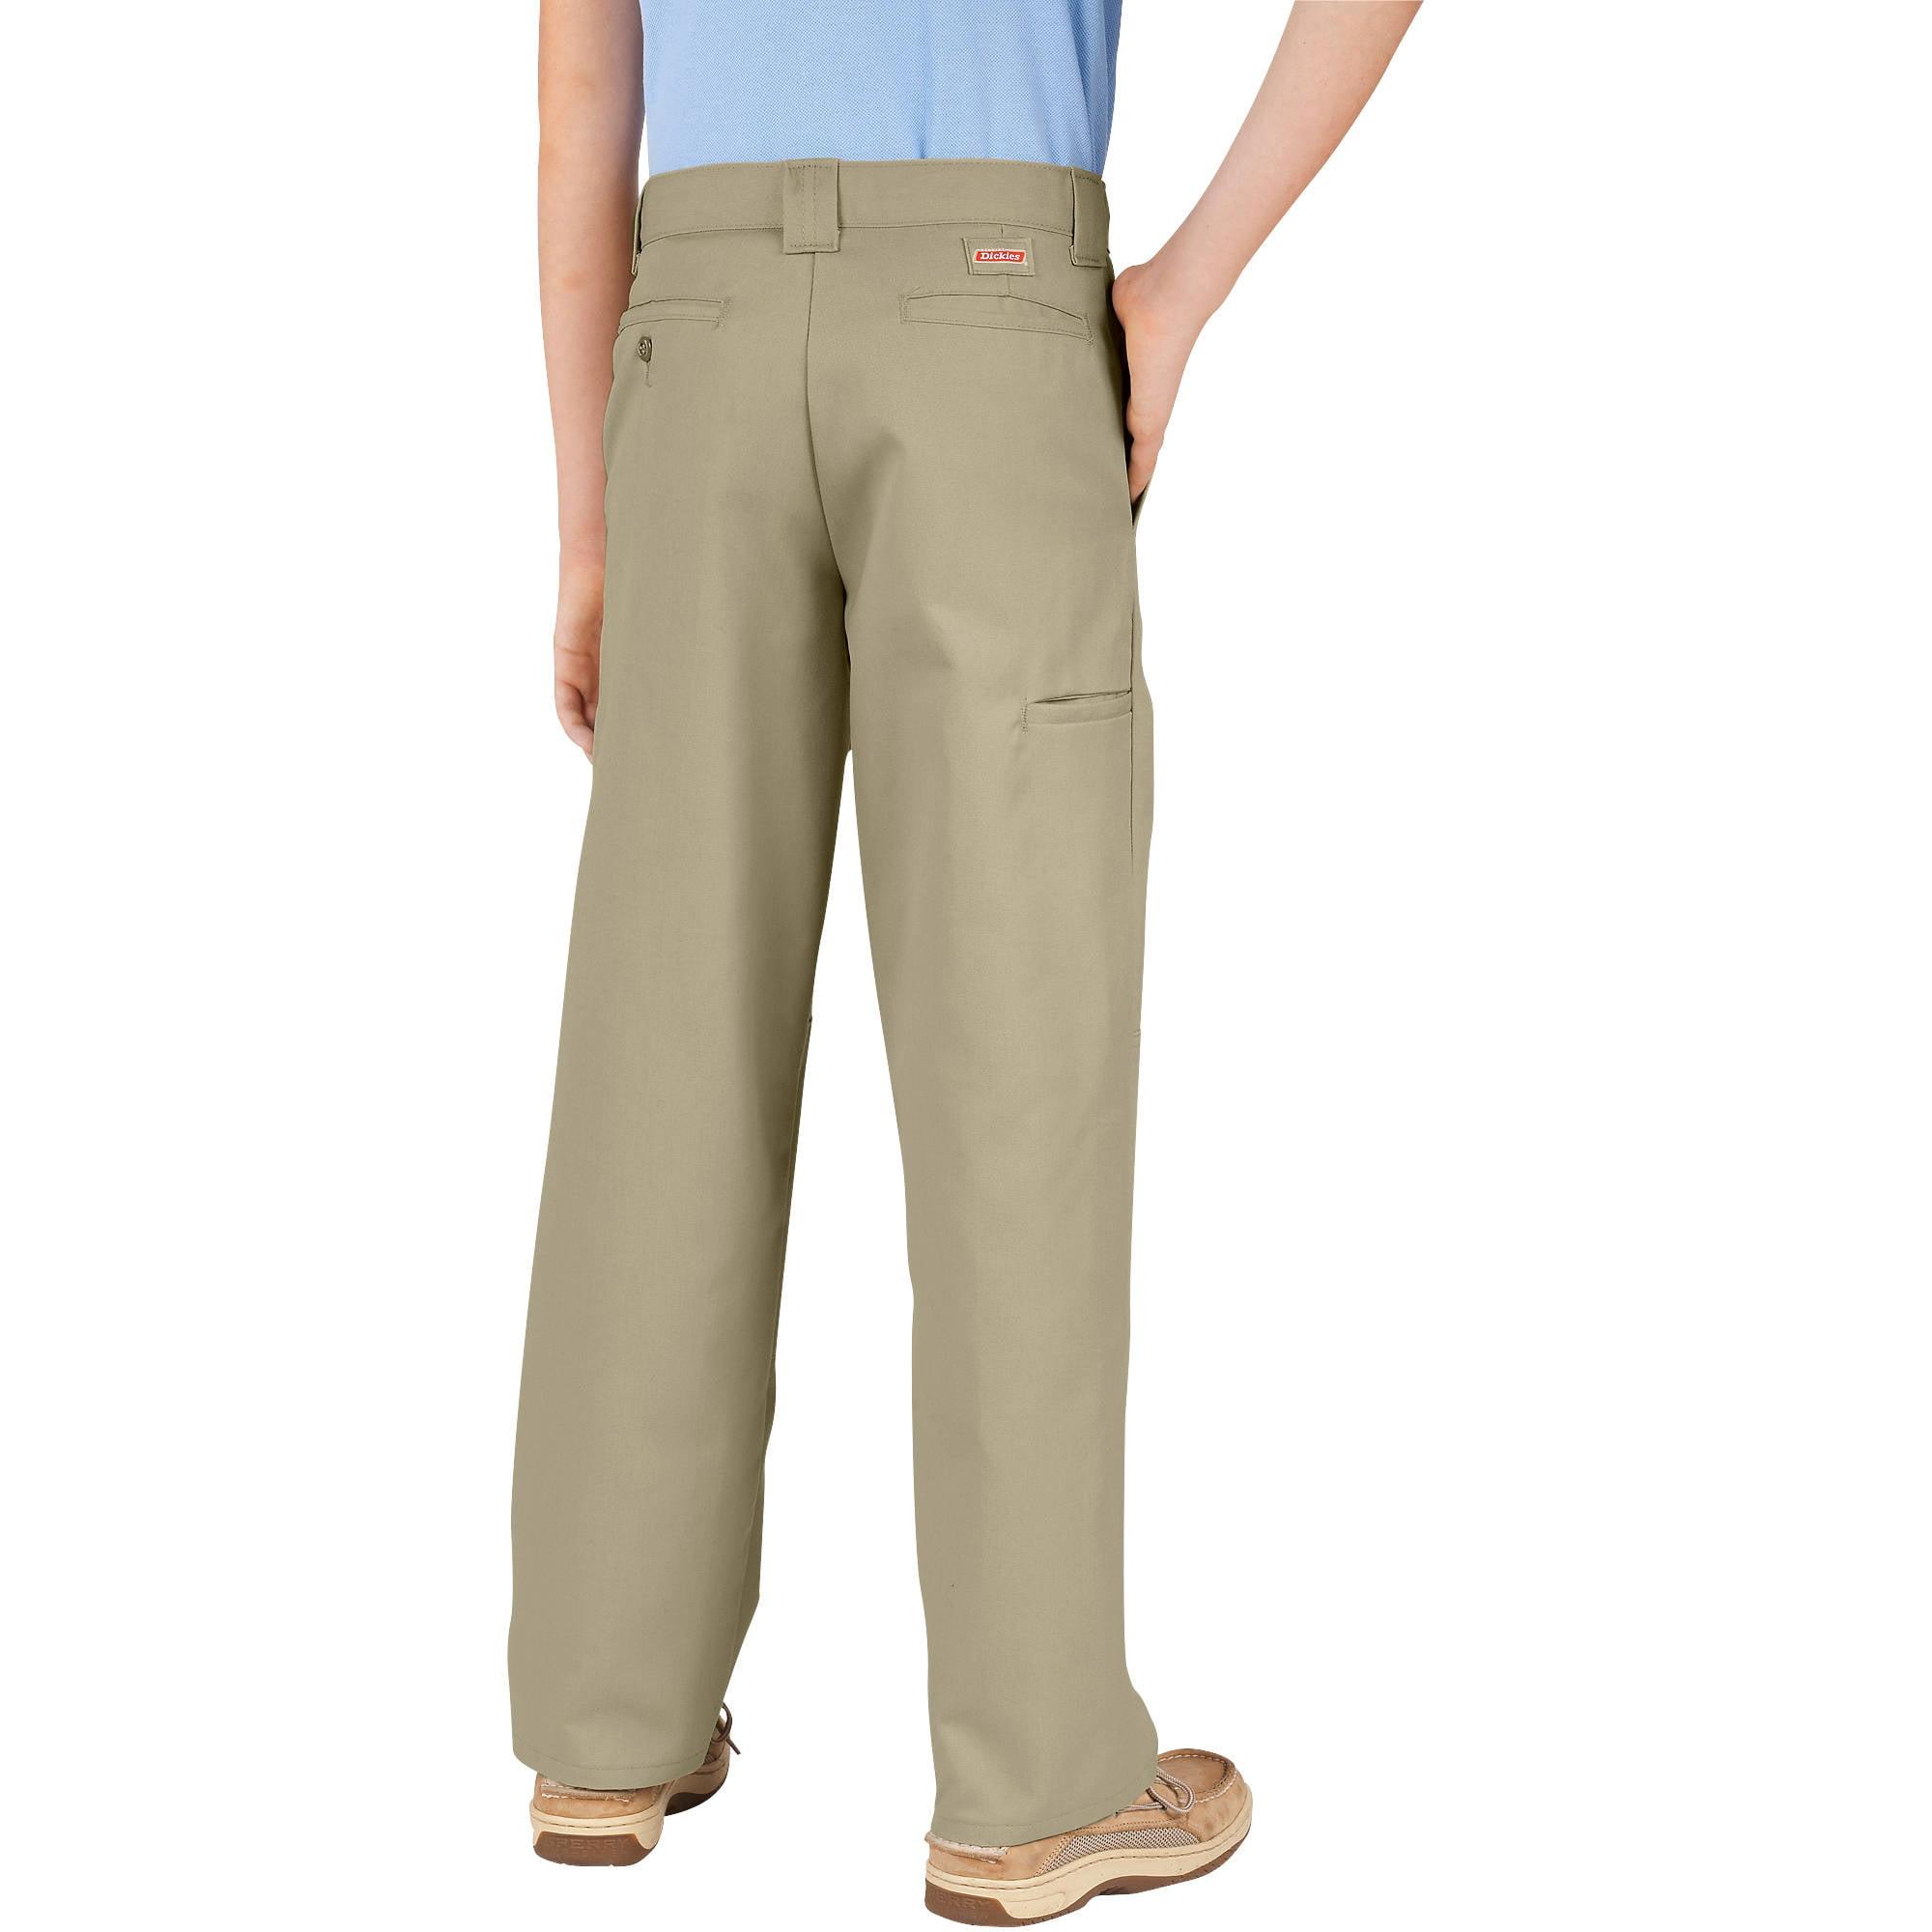 Genuine Dickies Husky Boys' Double-Knee Twill Pants - Walmart.com